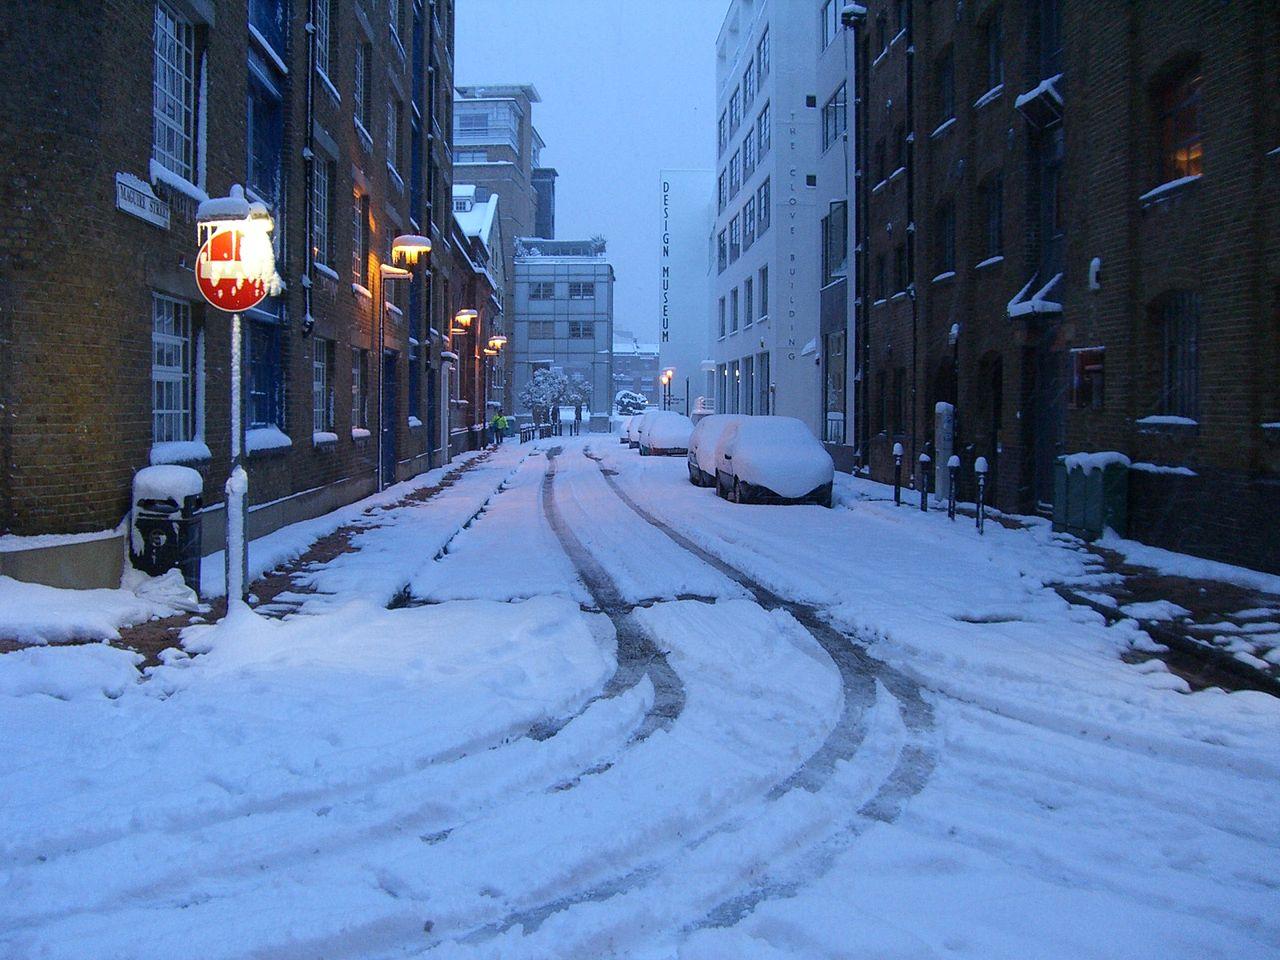 File:UK snow February 2, 2009 img007.jpg - Wikimedia Commons